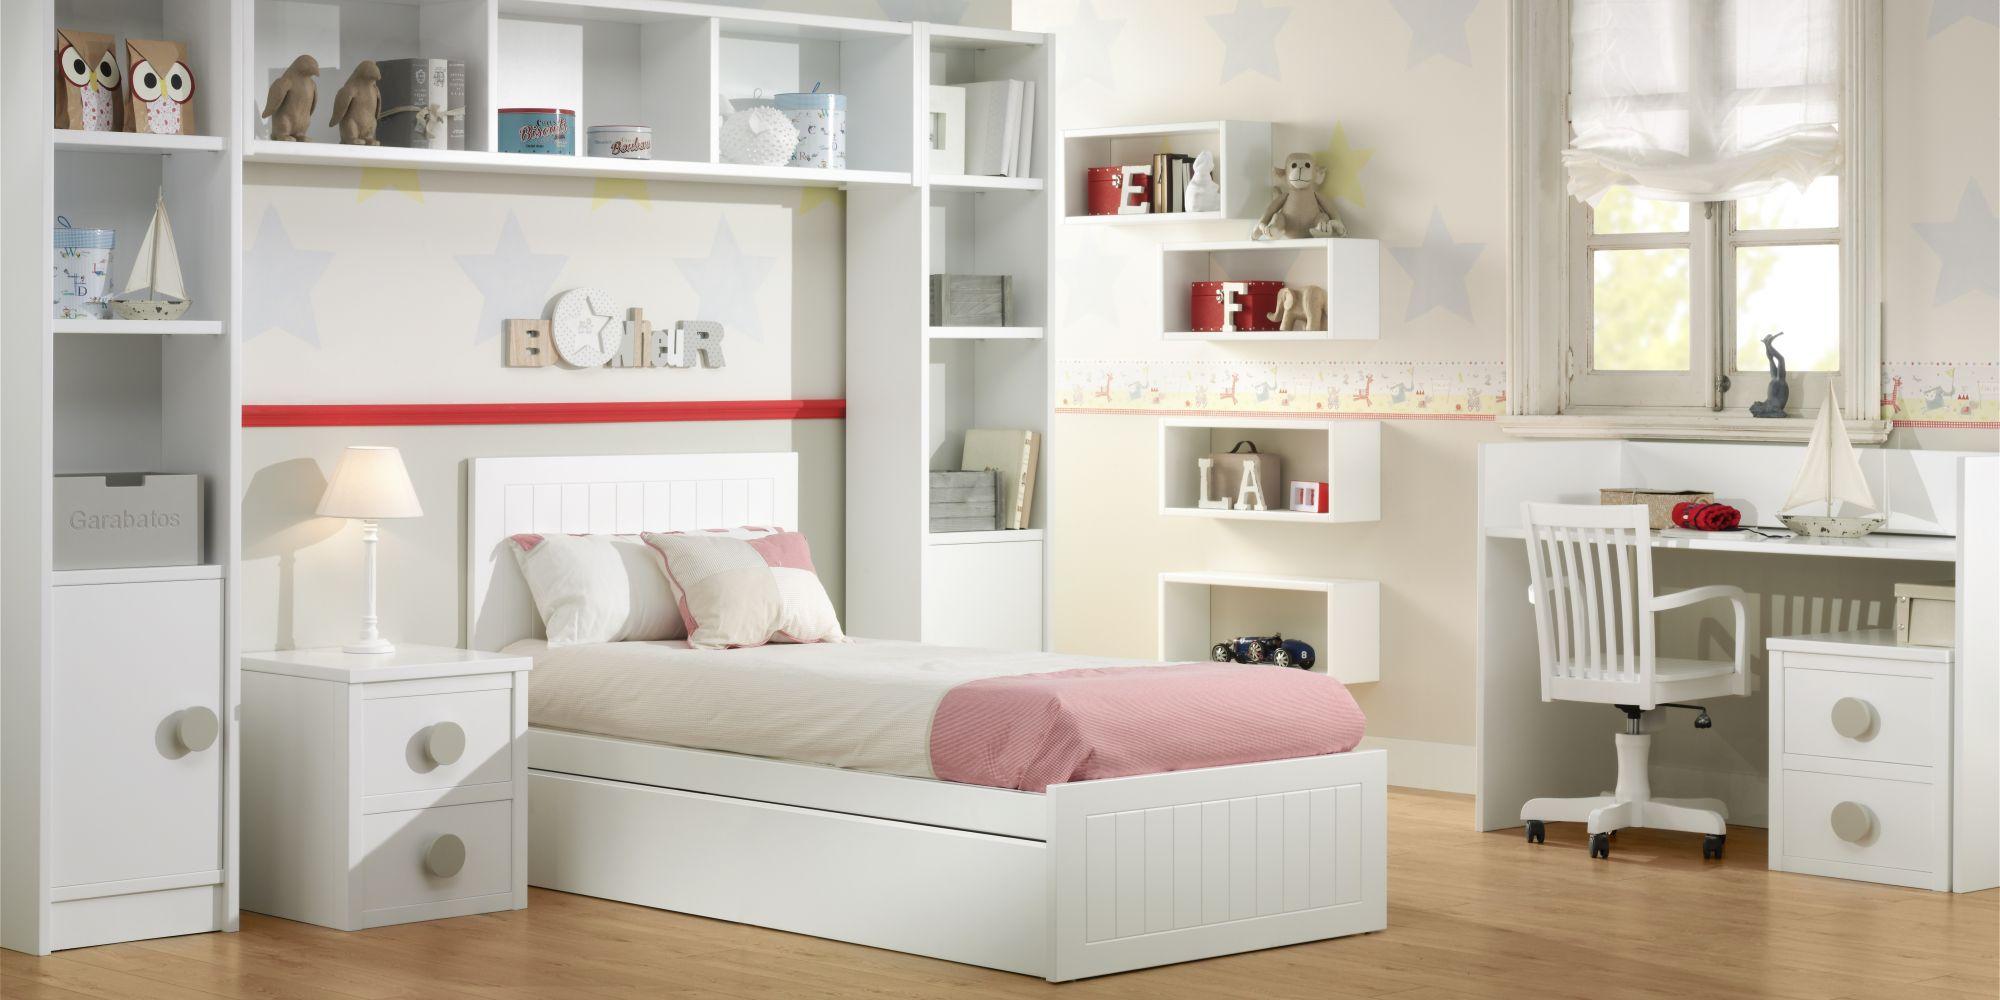 Convertible ideal para la primera cama